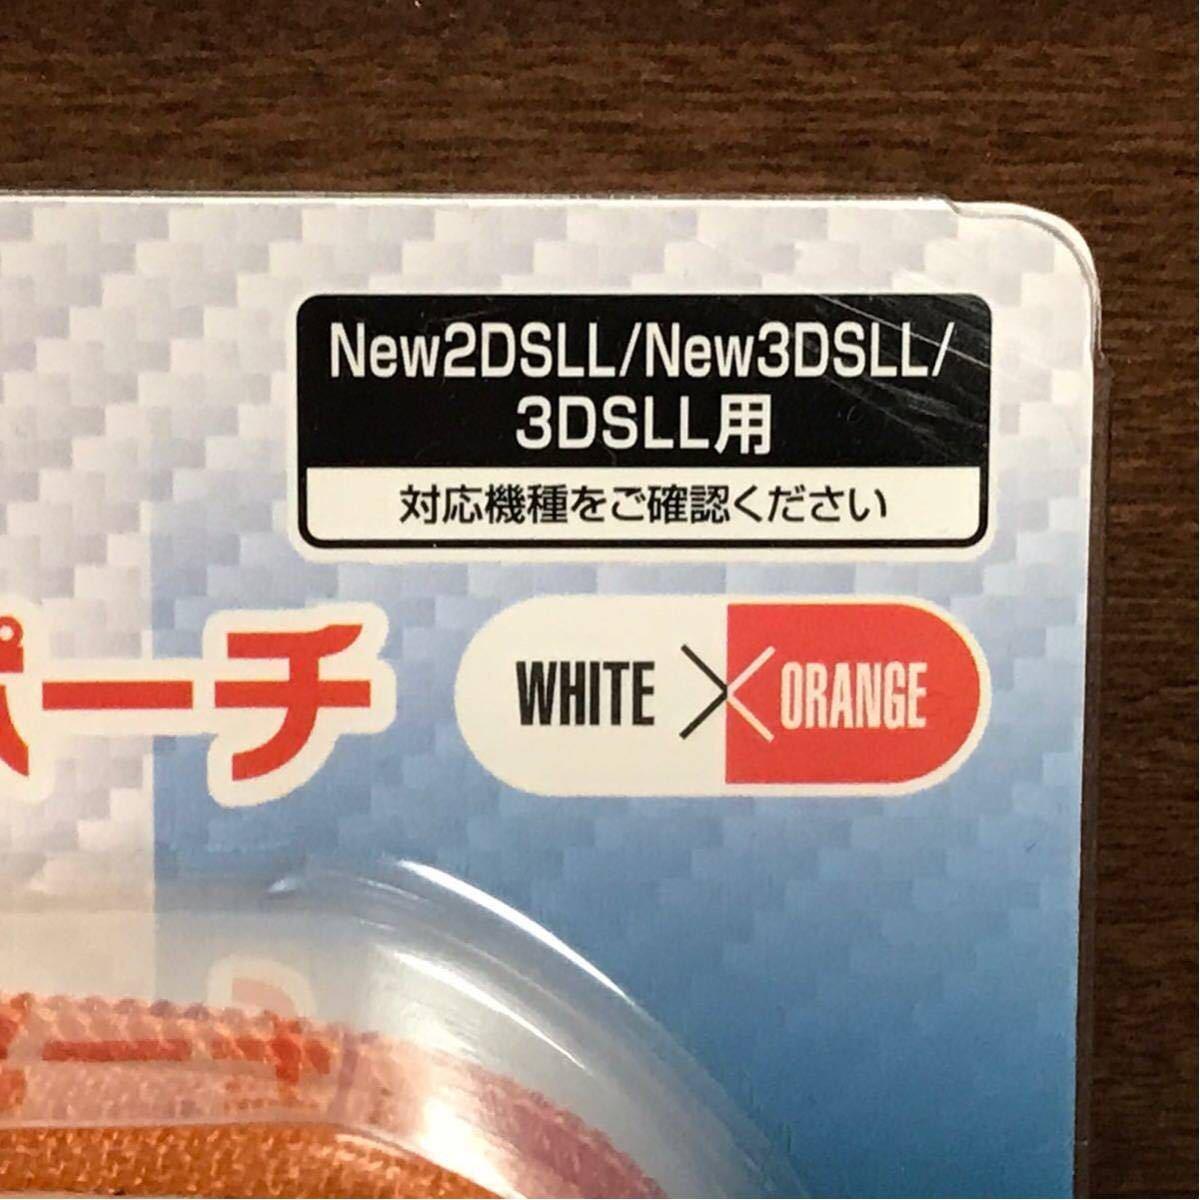 New2DSLL New3DSLL カーボンスタイルポーチ オレンジ ホワイト 任天堂 ニンテンドー